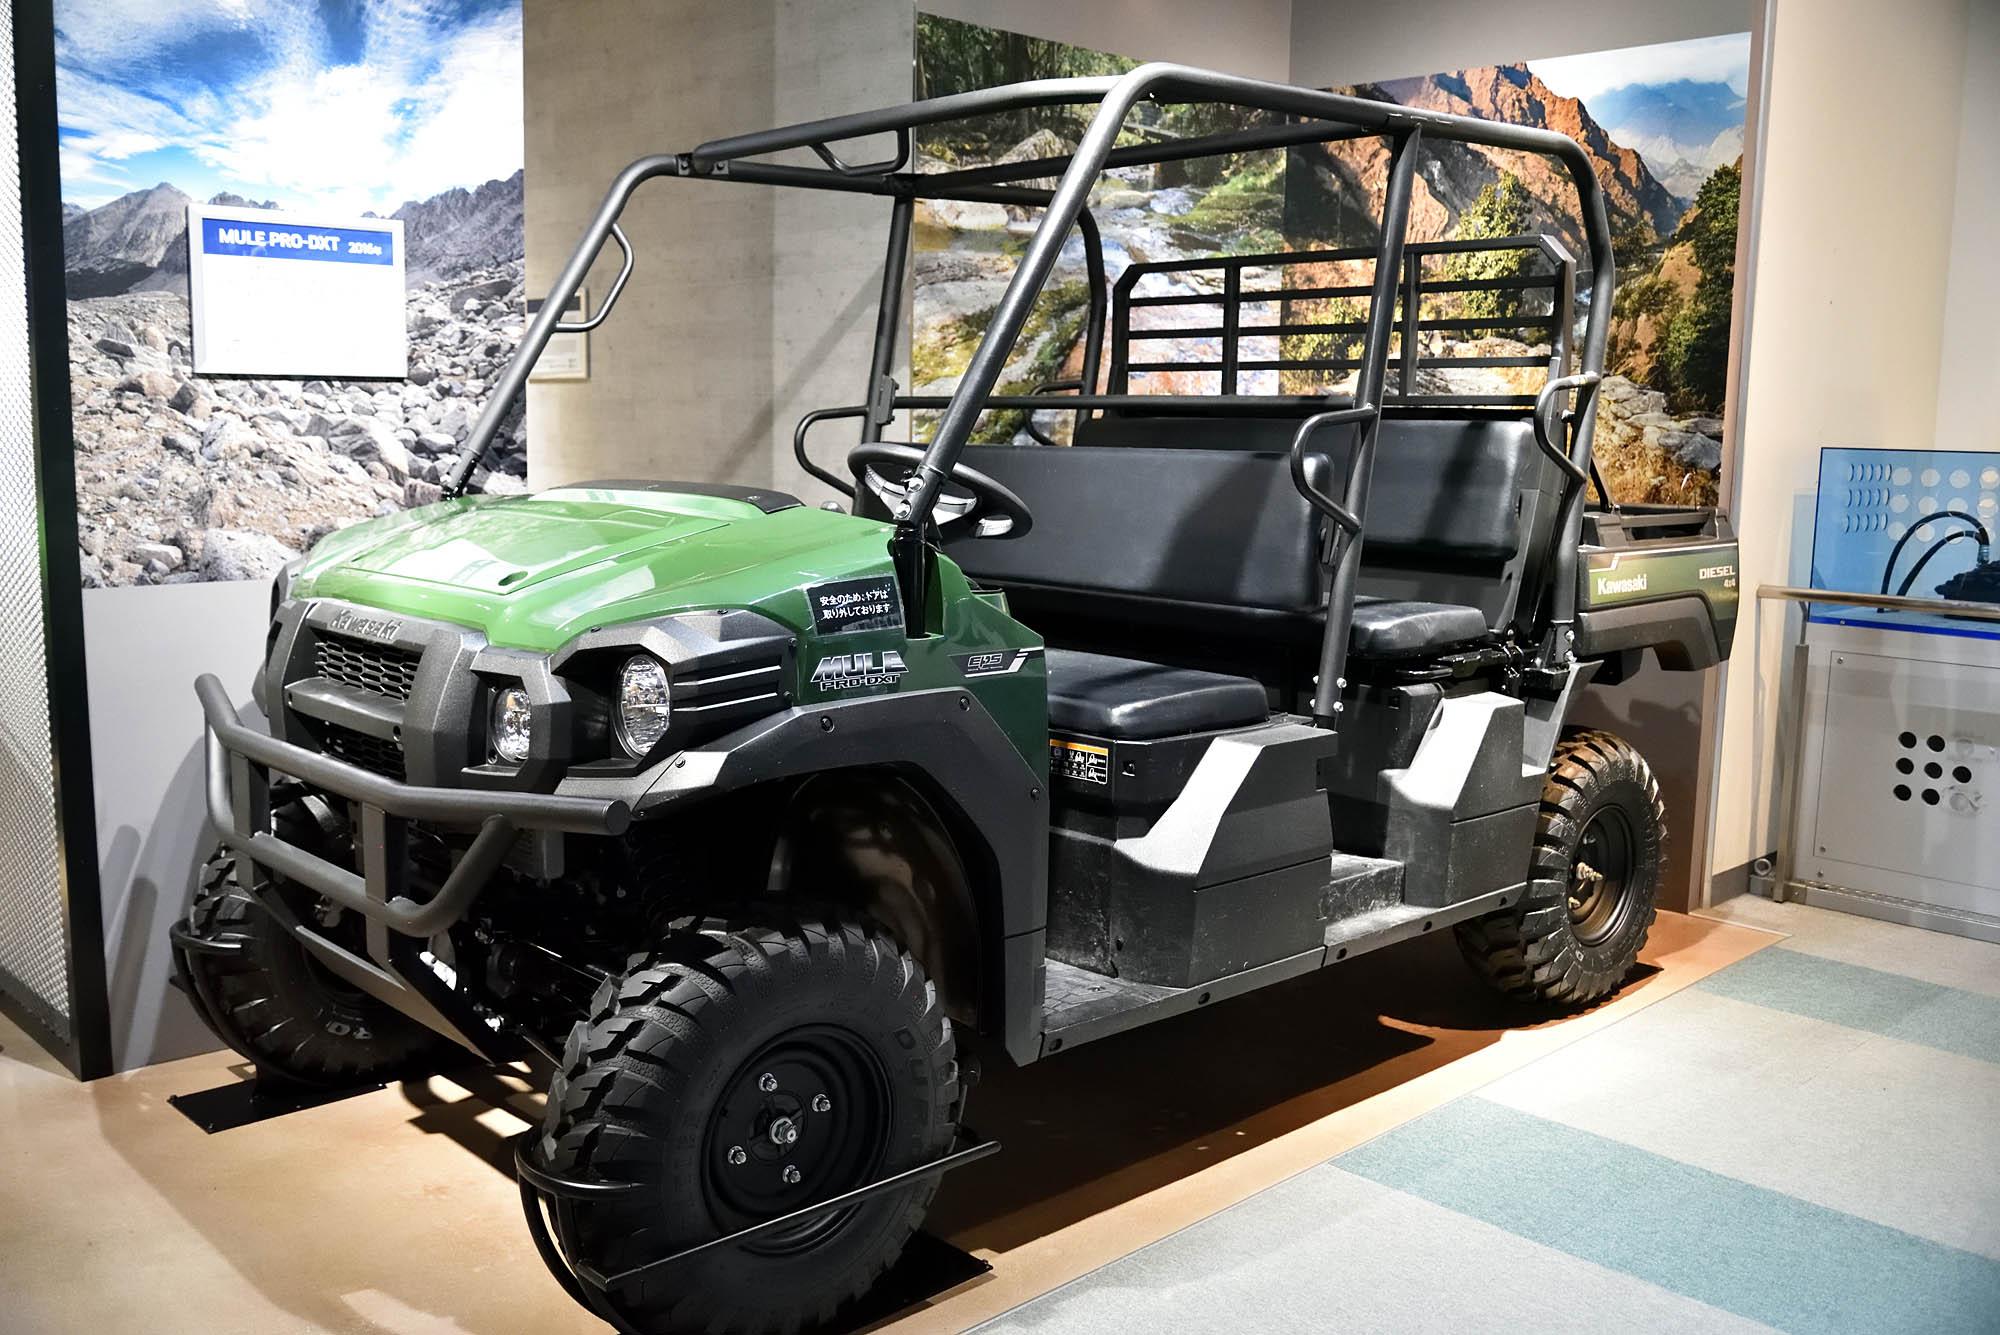 Kawasaki Mule Pro Fxt Vs Dxt